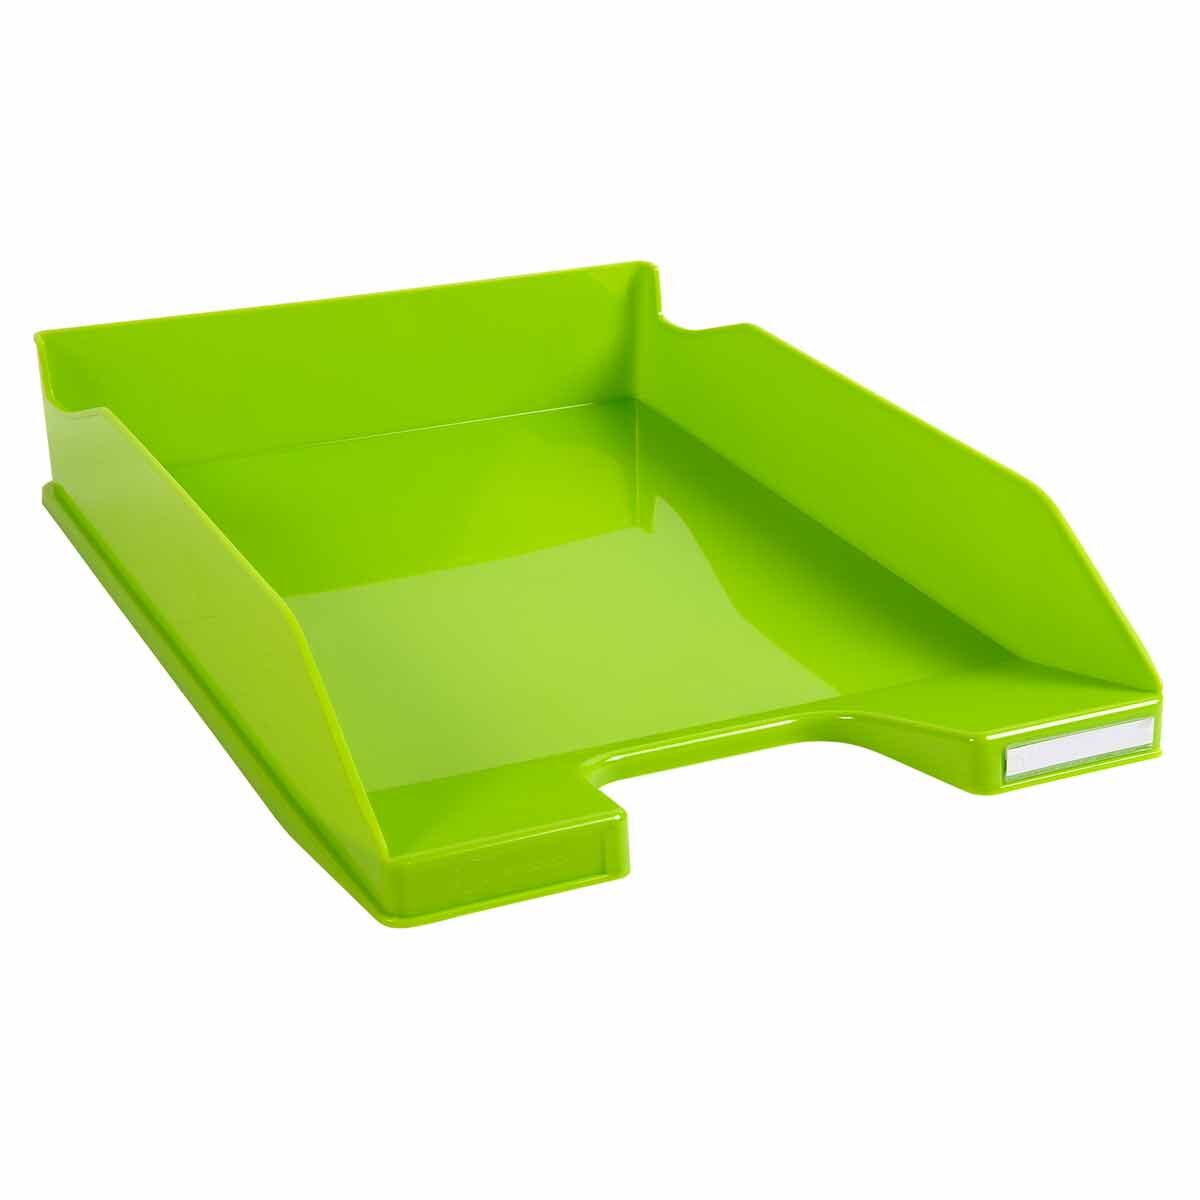 Exacompta Office Letter Tray Midi Combo Pack of 6 Gloss Lime Green